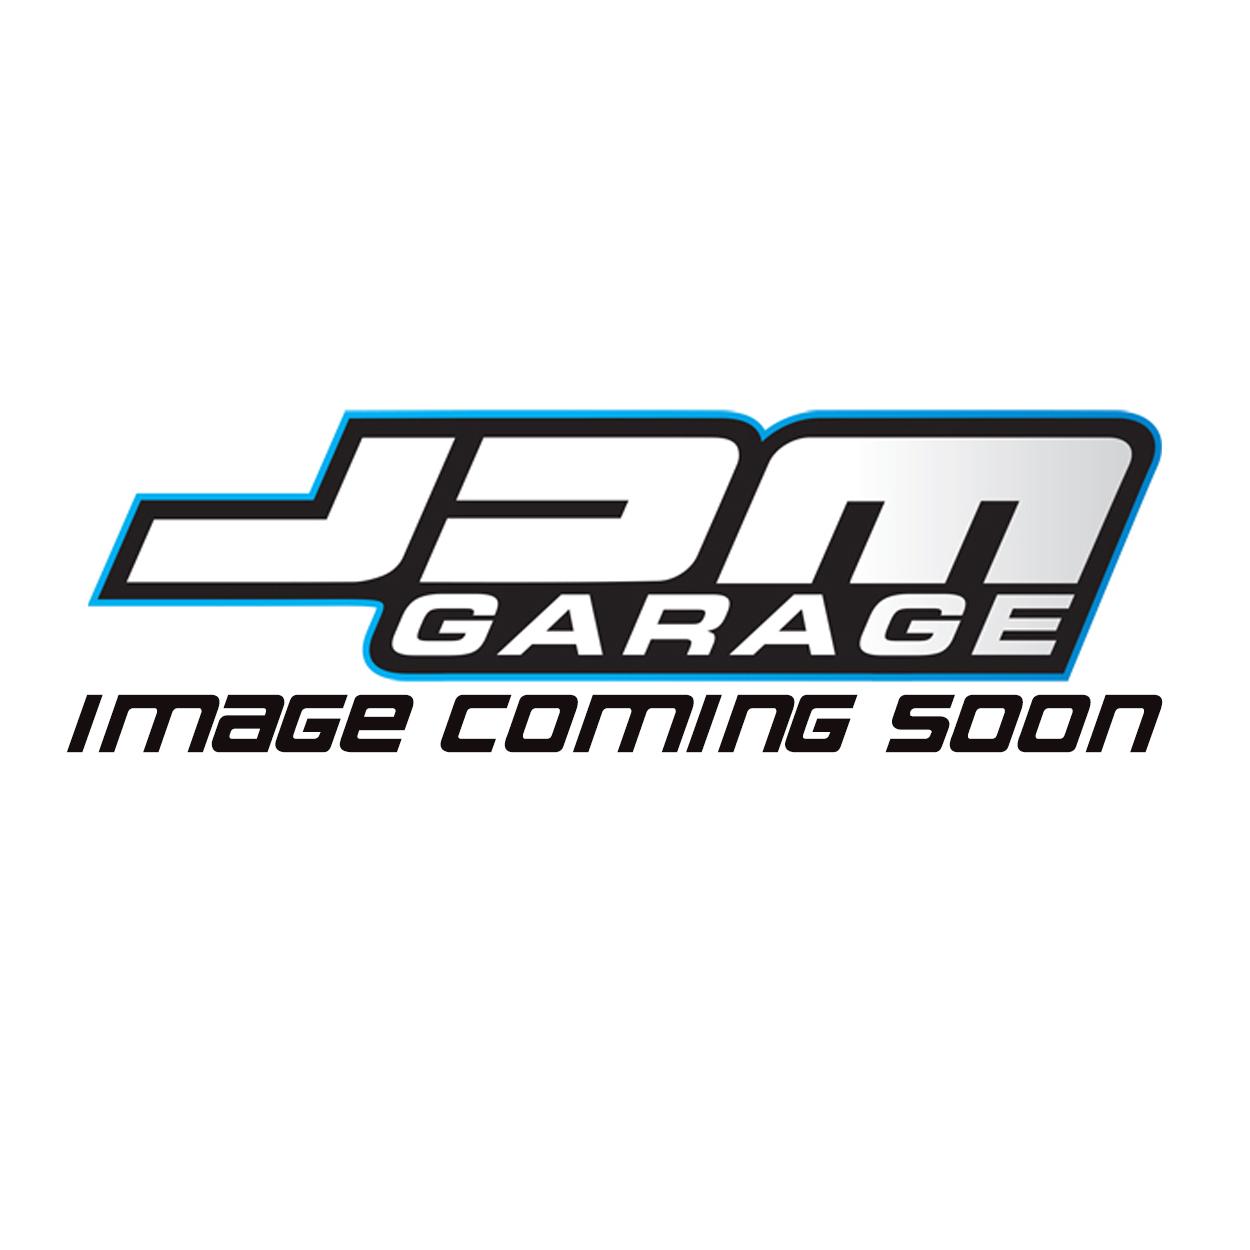 Genuine Nissan OEM Oil Filter Silvia S13 S14 S15 SR20DET 15208-53J0A 15208-31U0B